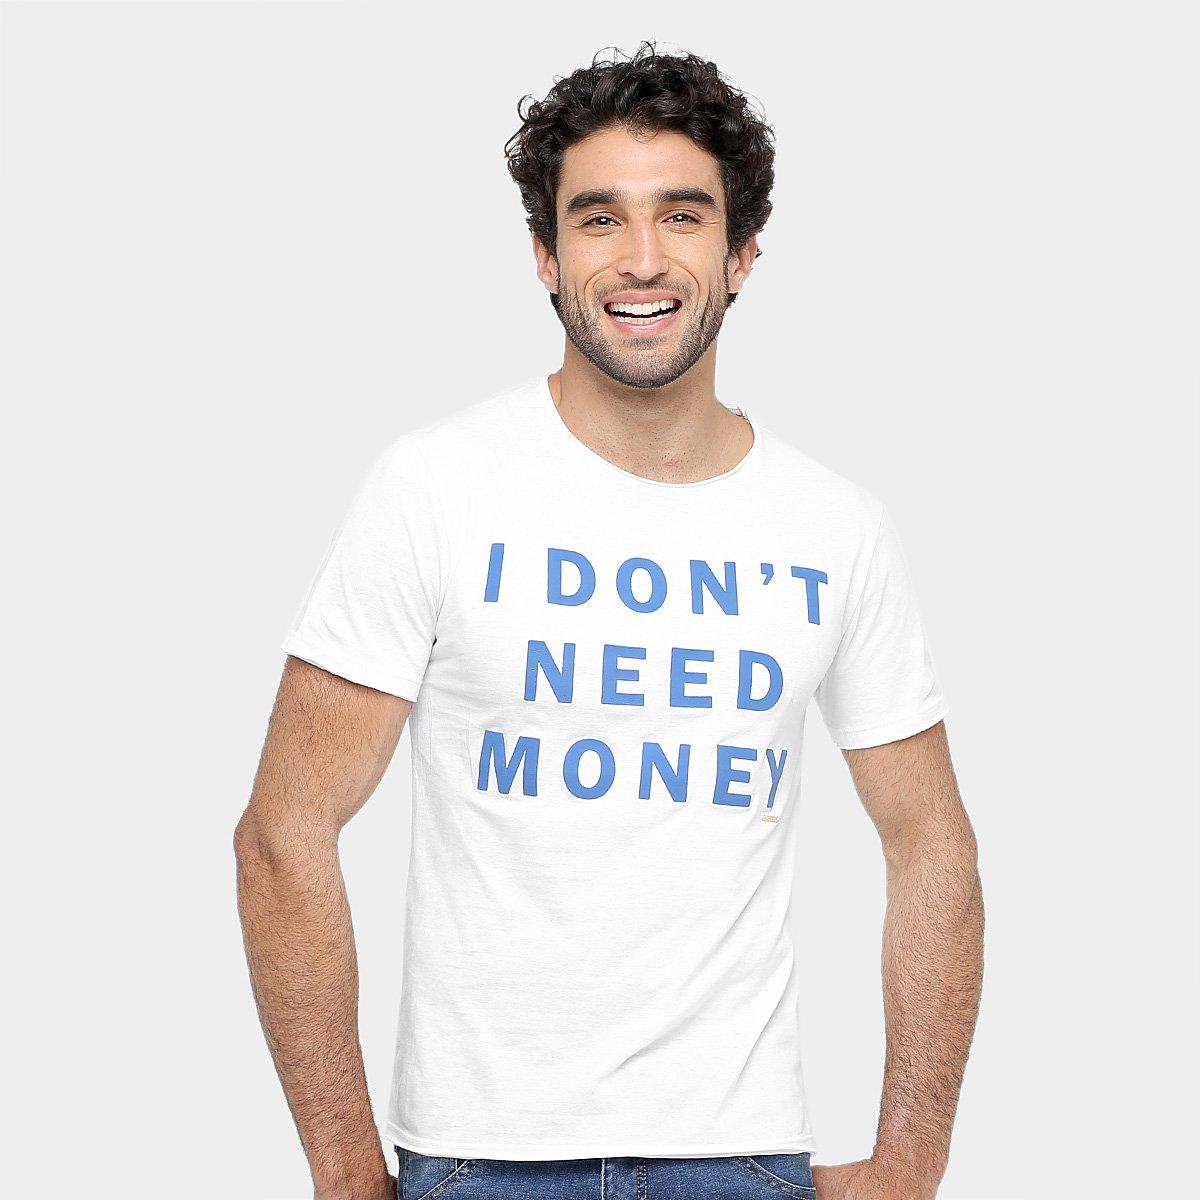 a8f9ac1ba Camiseta Sergio K Estampa Money Masculina - Compre Agora | Zattini